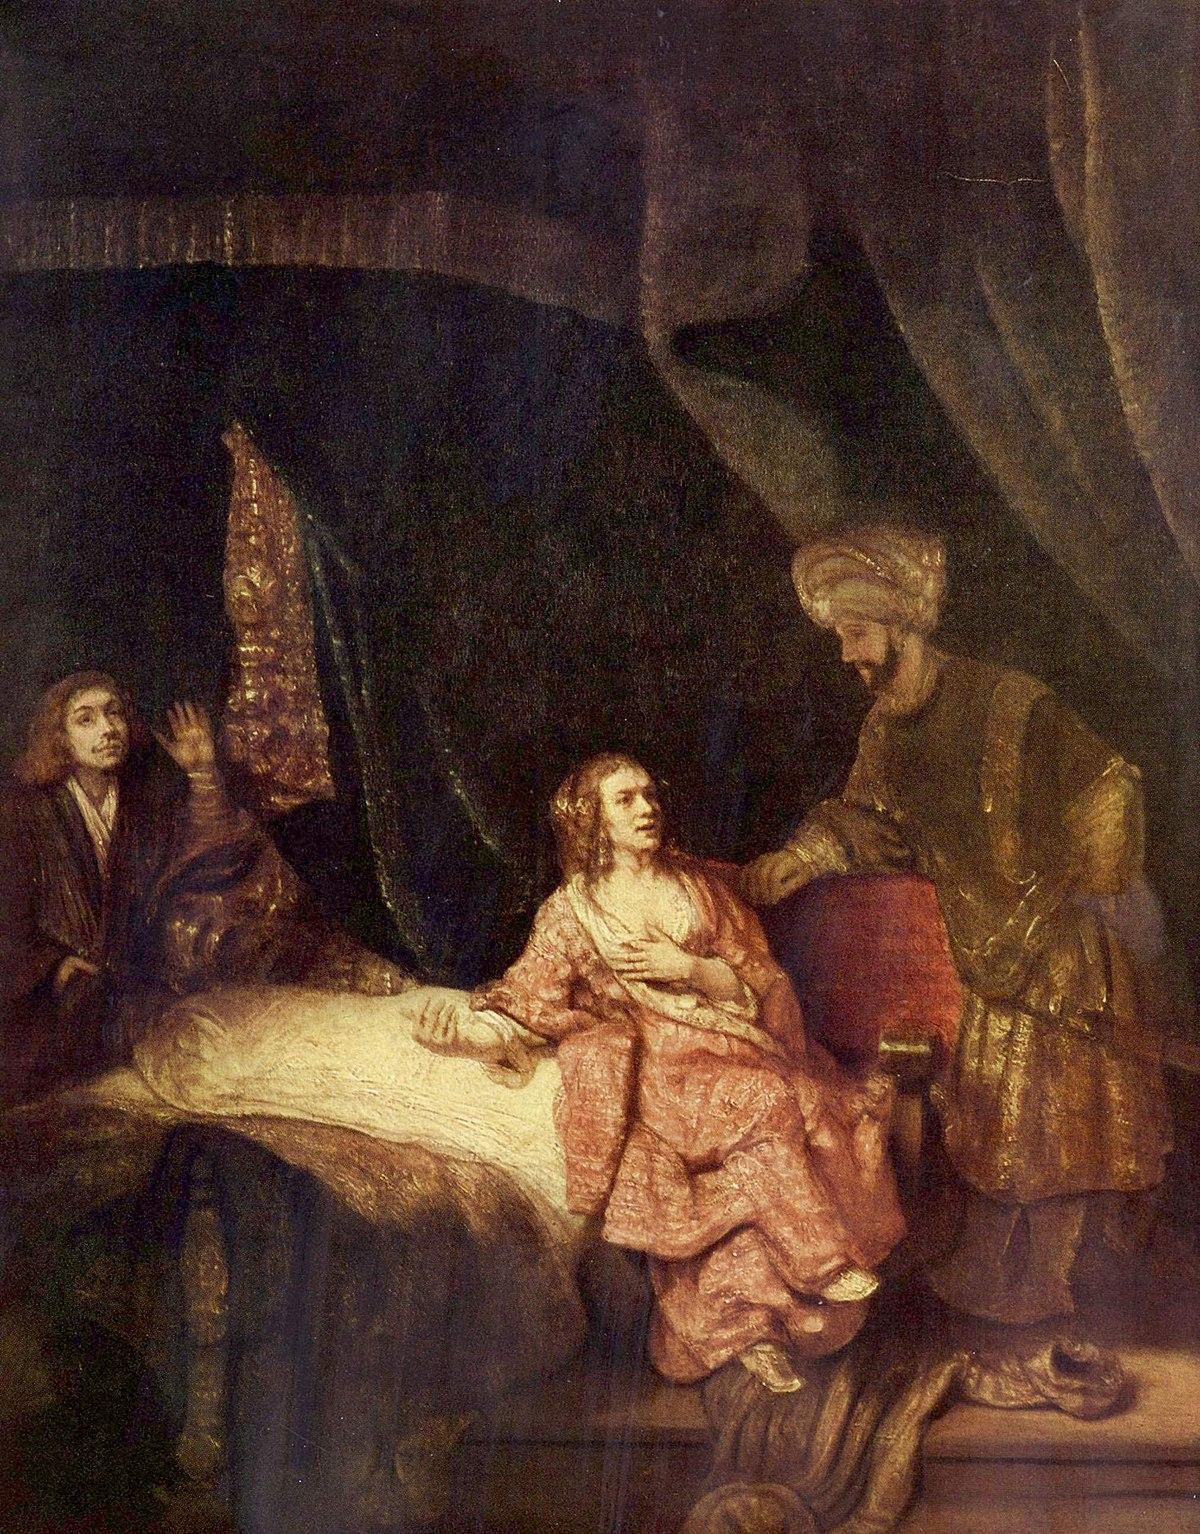 jozef en de vrouw potifar